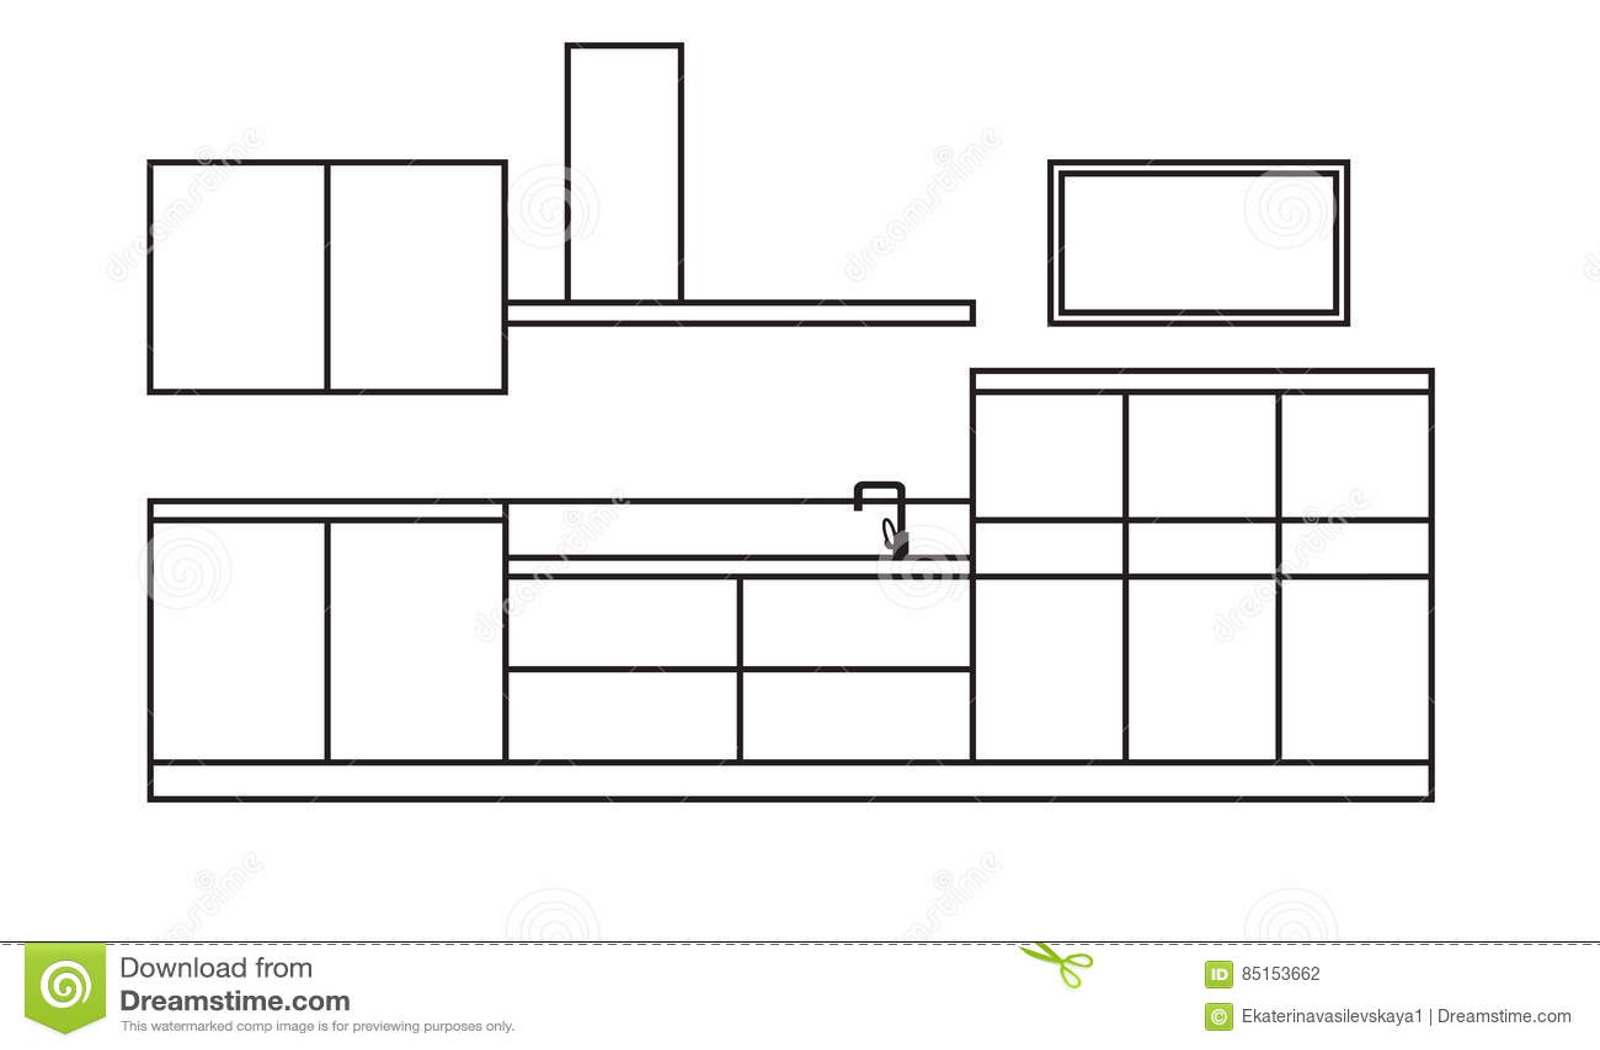 Draft Of Kitchen Vector Illustration 9672936